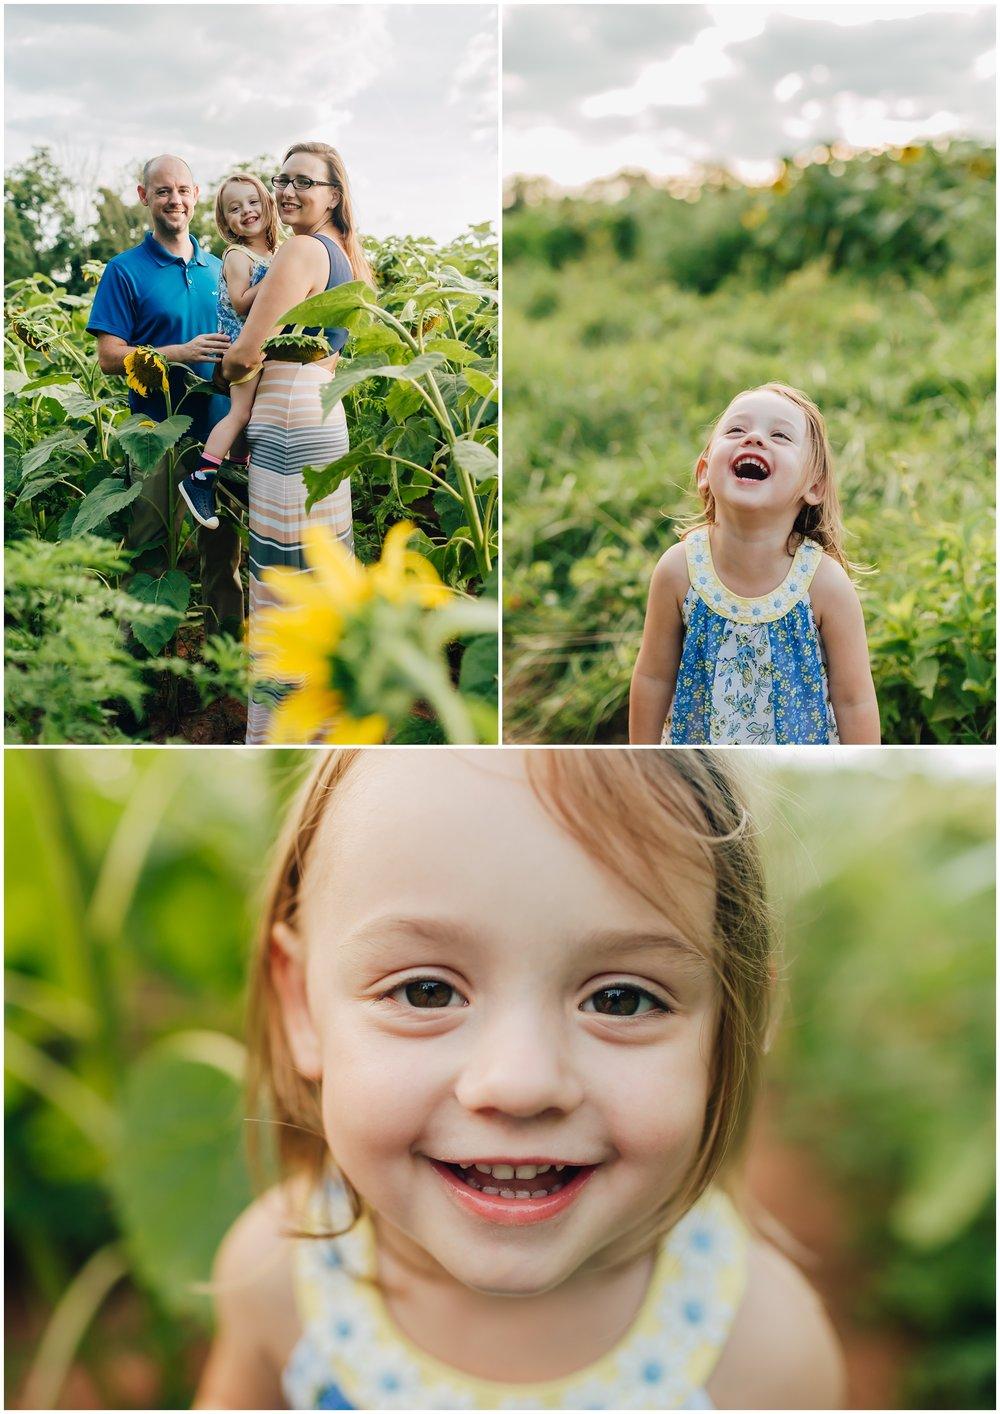 mckee-beshers-sunflowers-family-photography-2.jpg